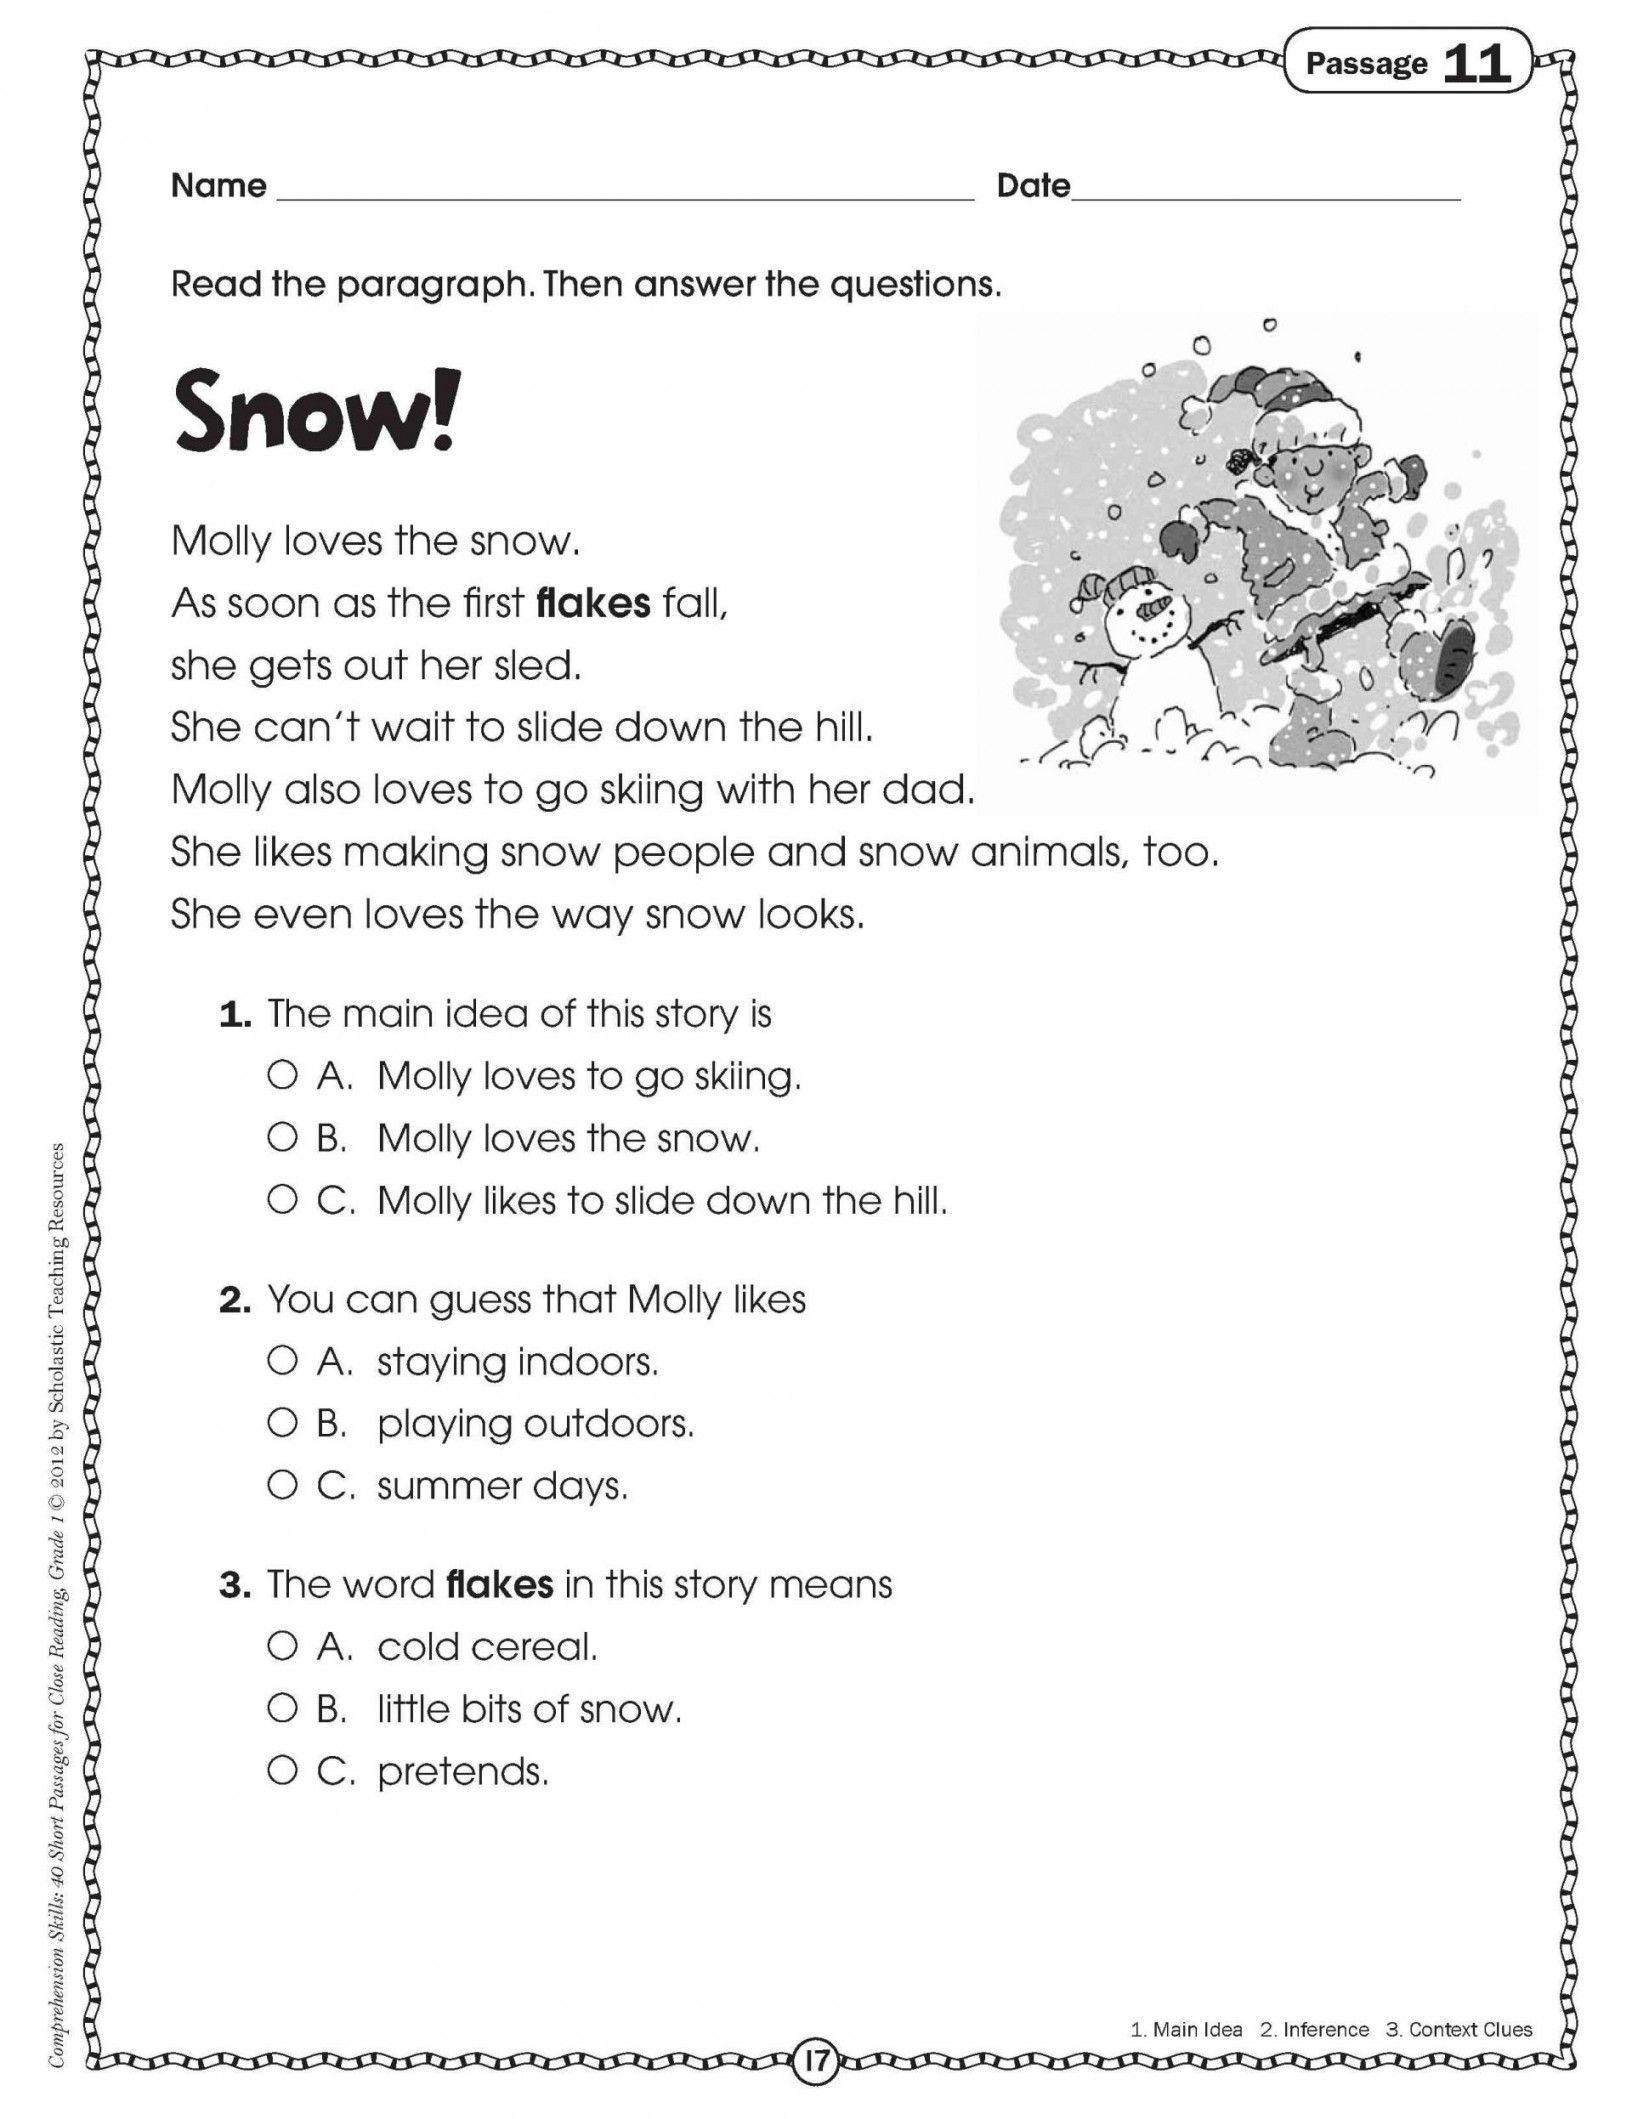 Printable Reading Comprehension Worksheets For Reading Worksheets - Free Printable Grade 1 Reading Comprehension Worksheets